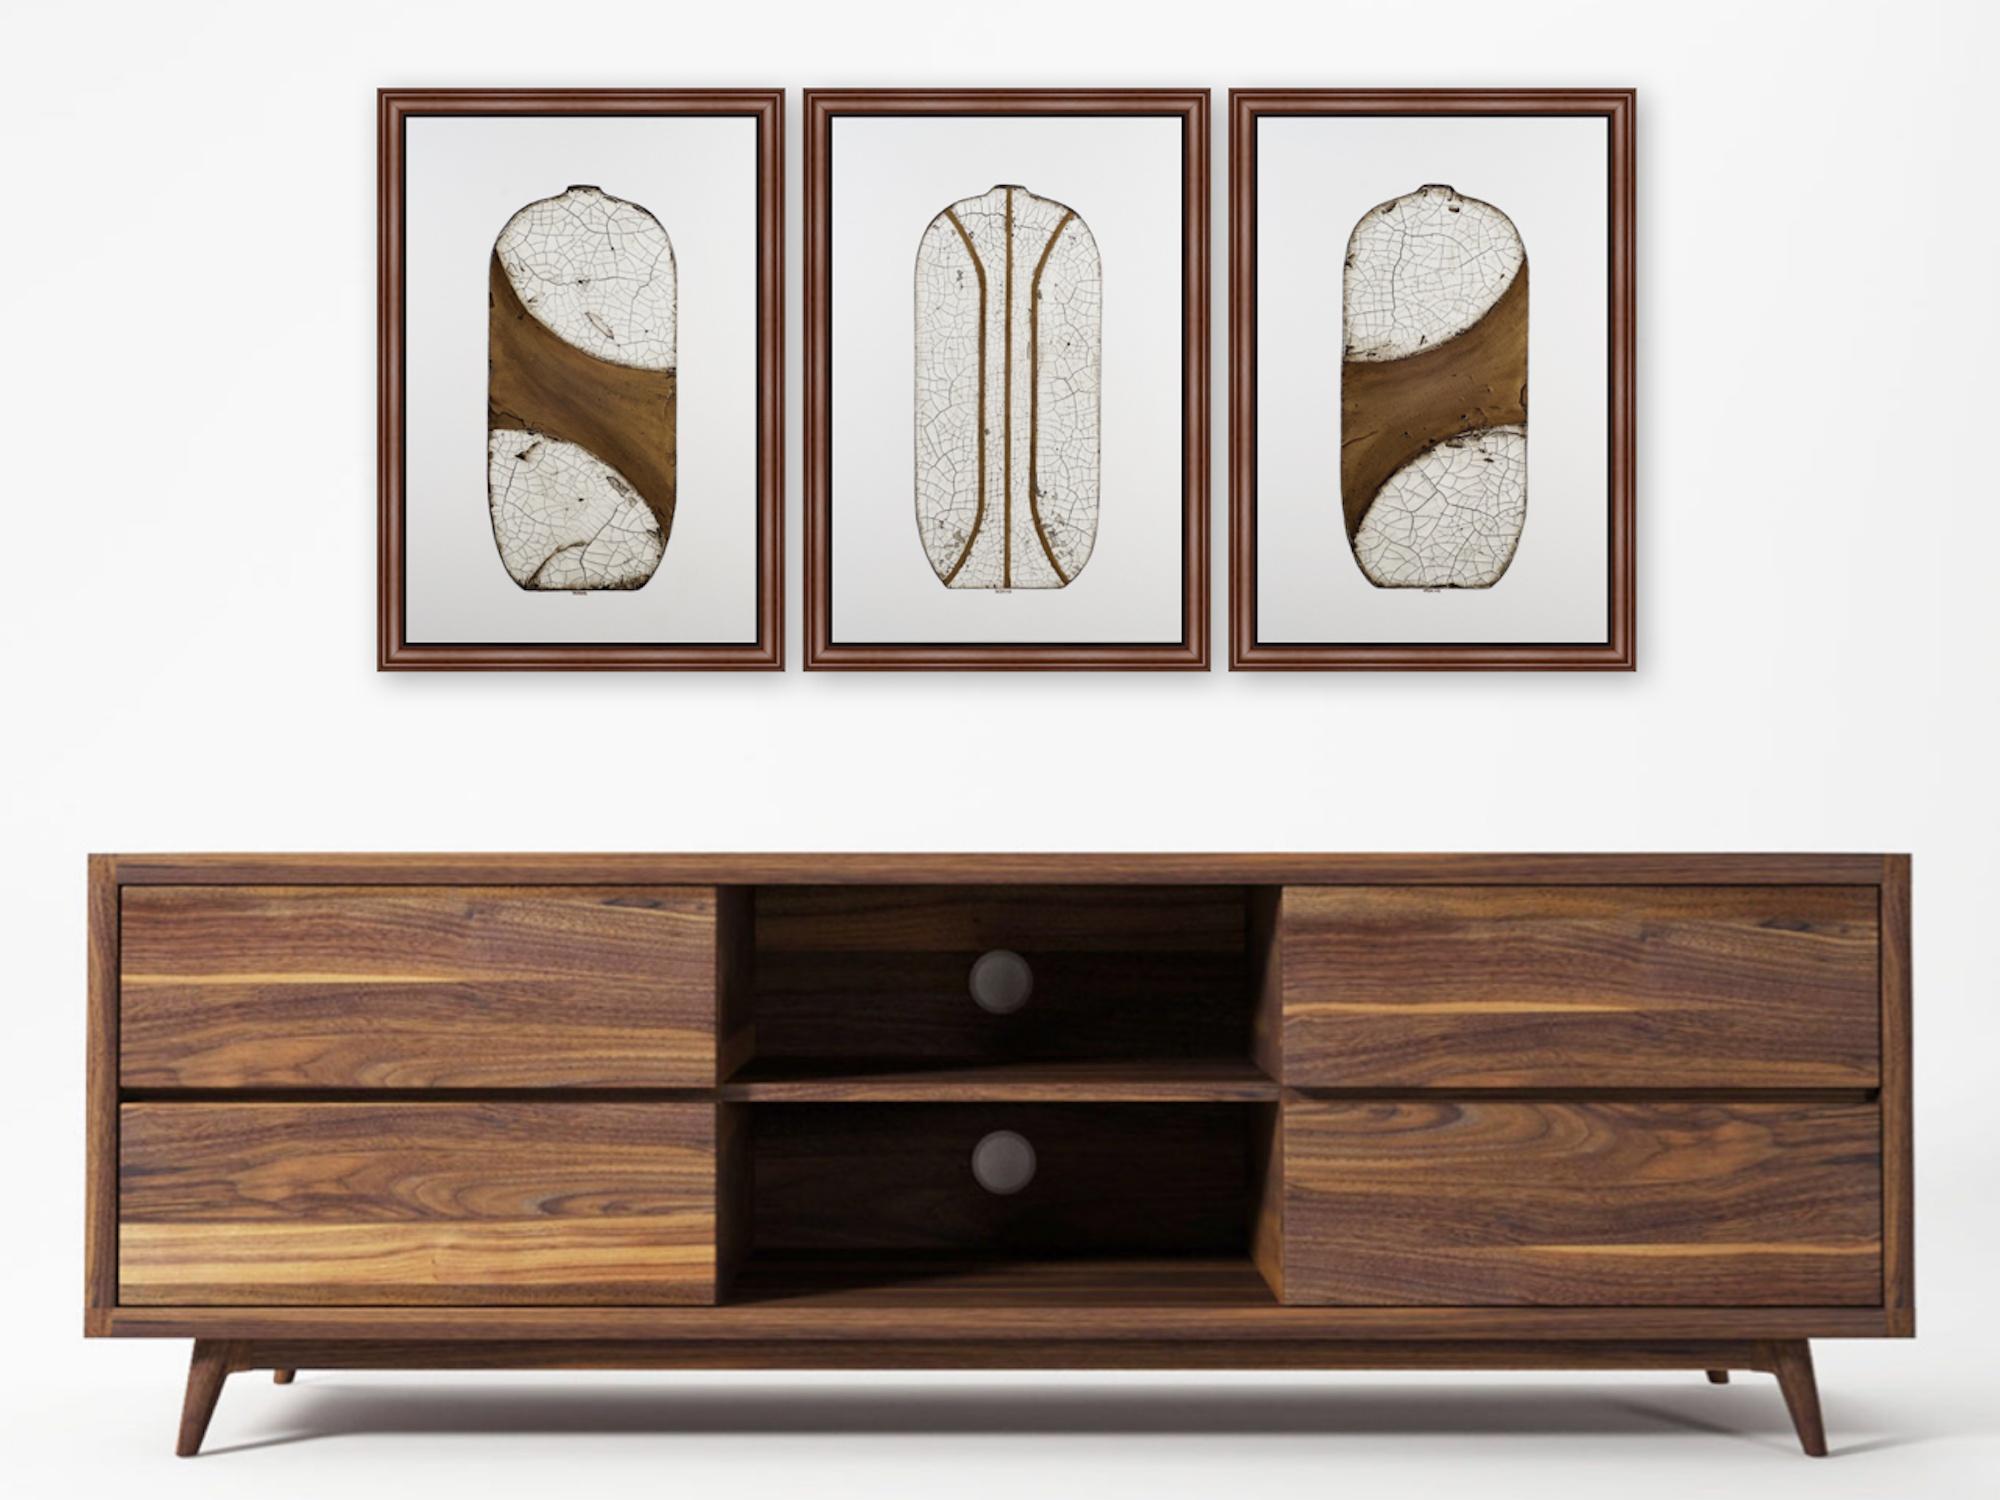 Triptych painting of raku pots by artist Terri Deskins